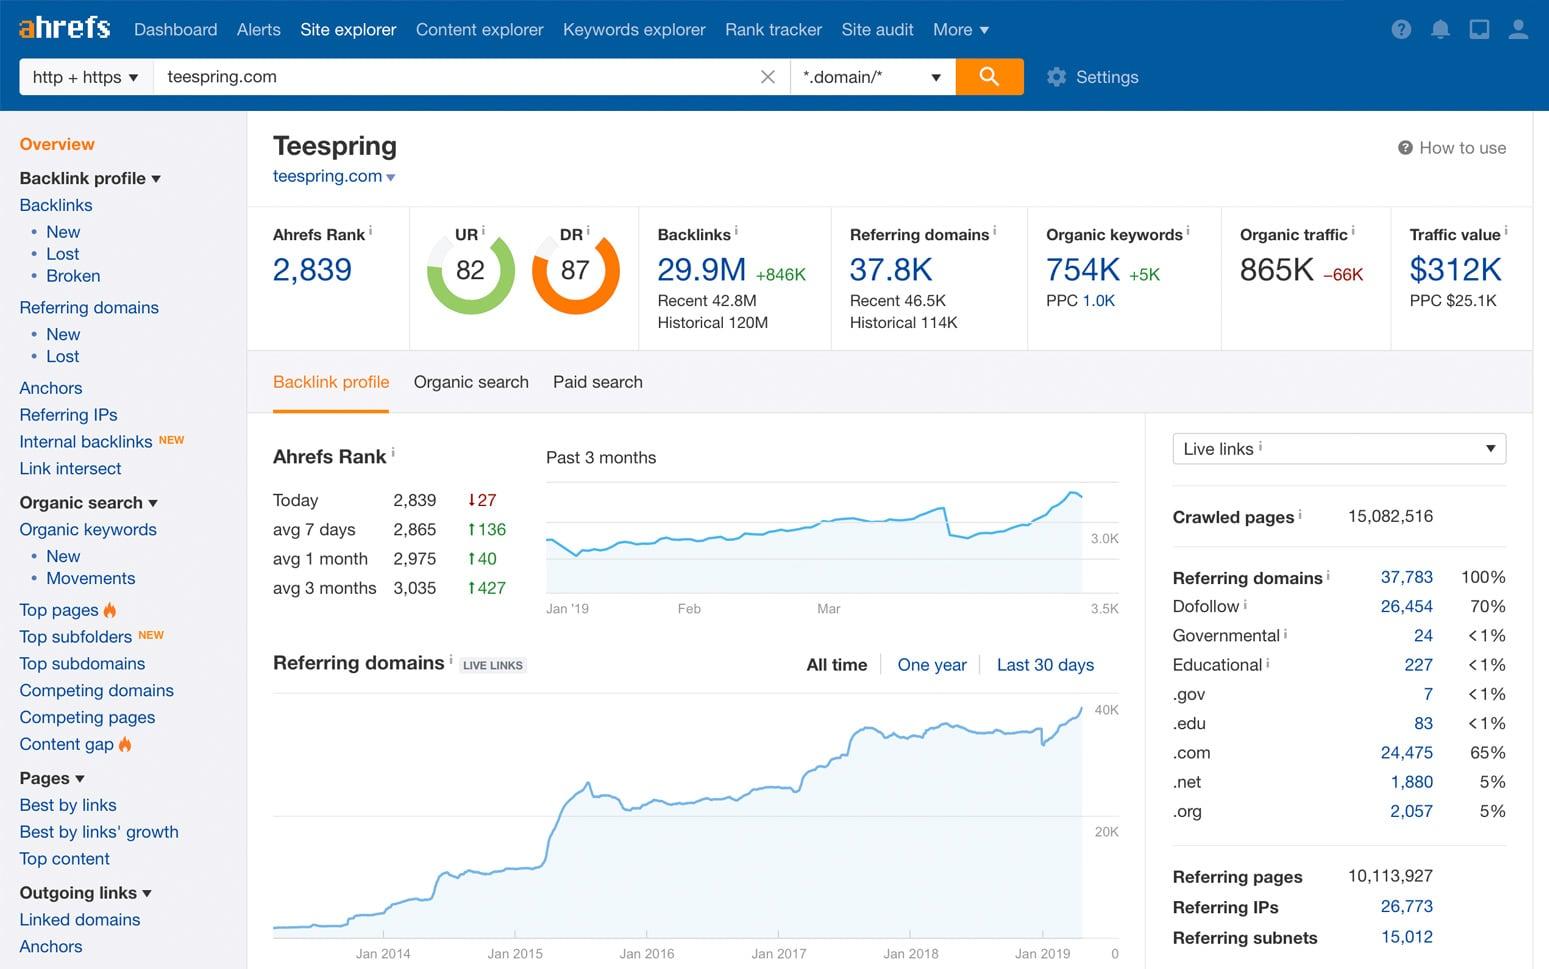 ahrefs seo tools to grow traffic agiletech